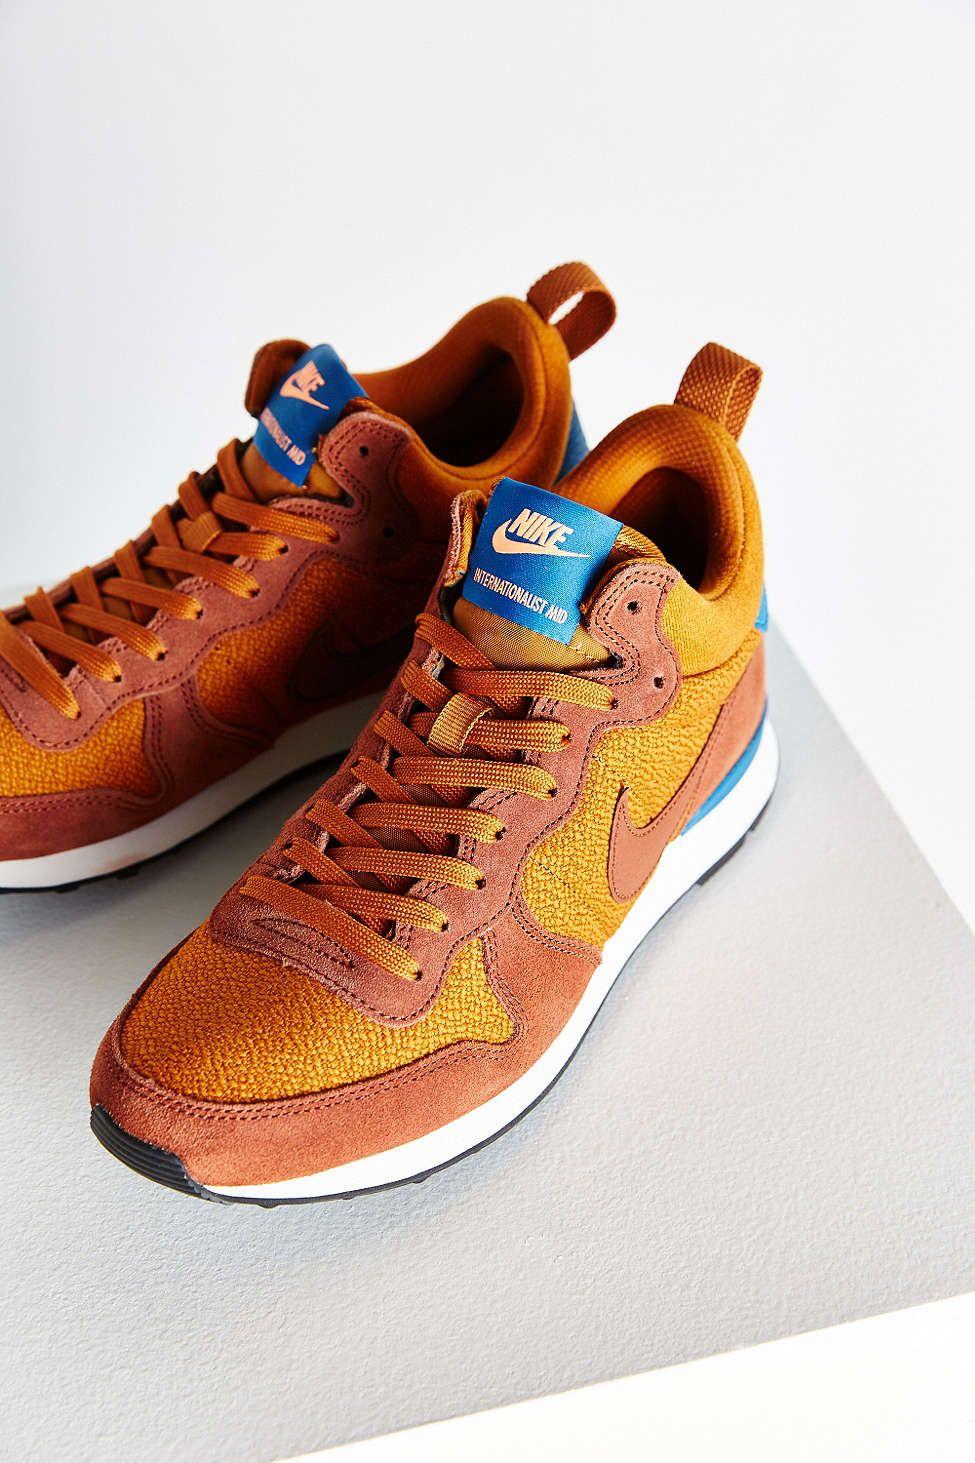 wholesale dealer 87c95 e11bc ... switzerland nike internationalist mid sneaker i need these rn 9d384  6fedb